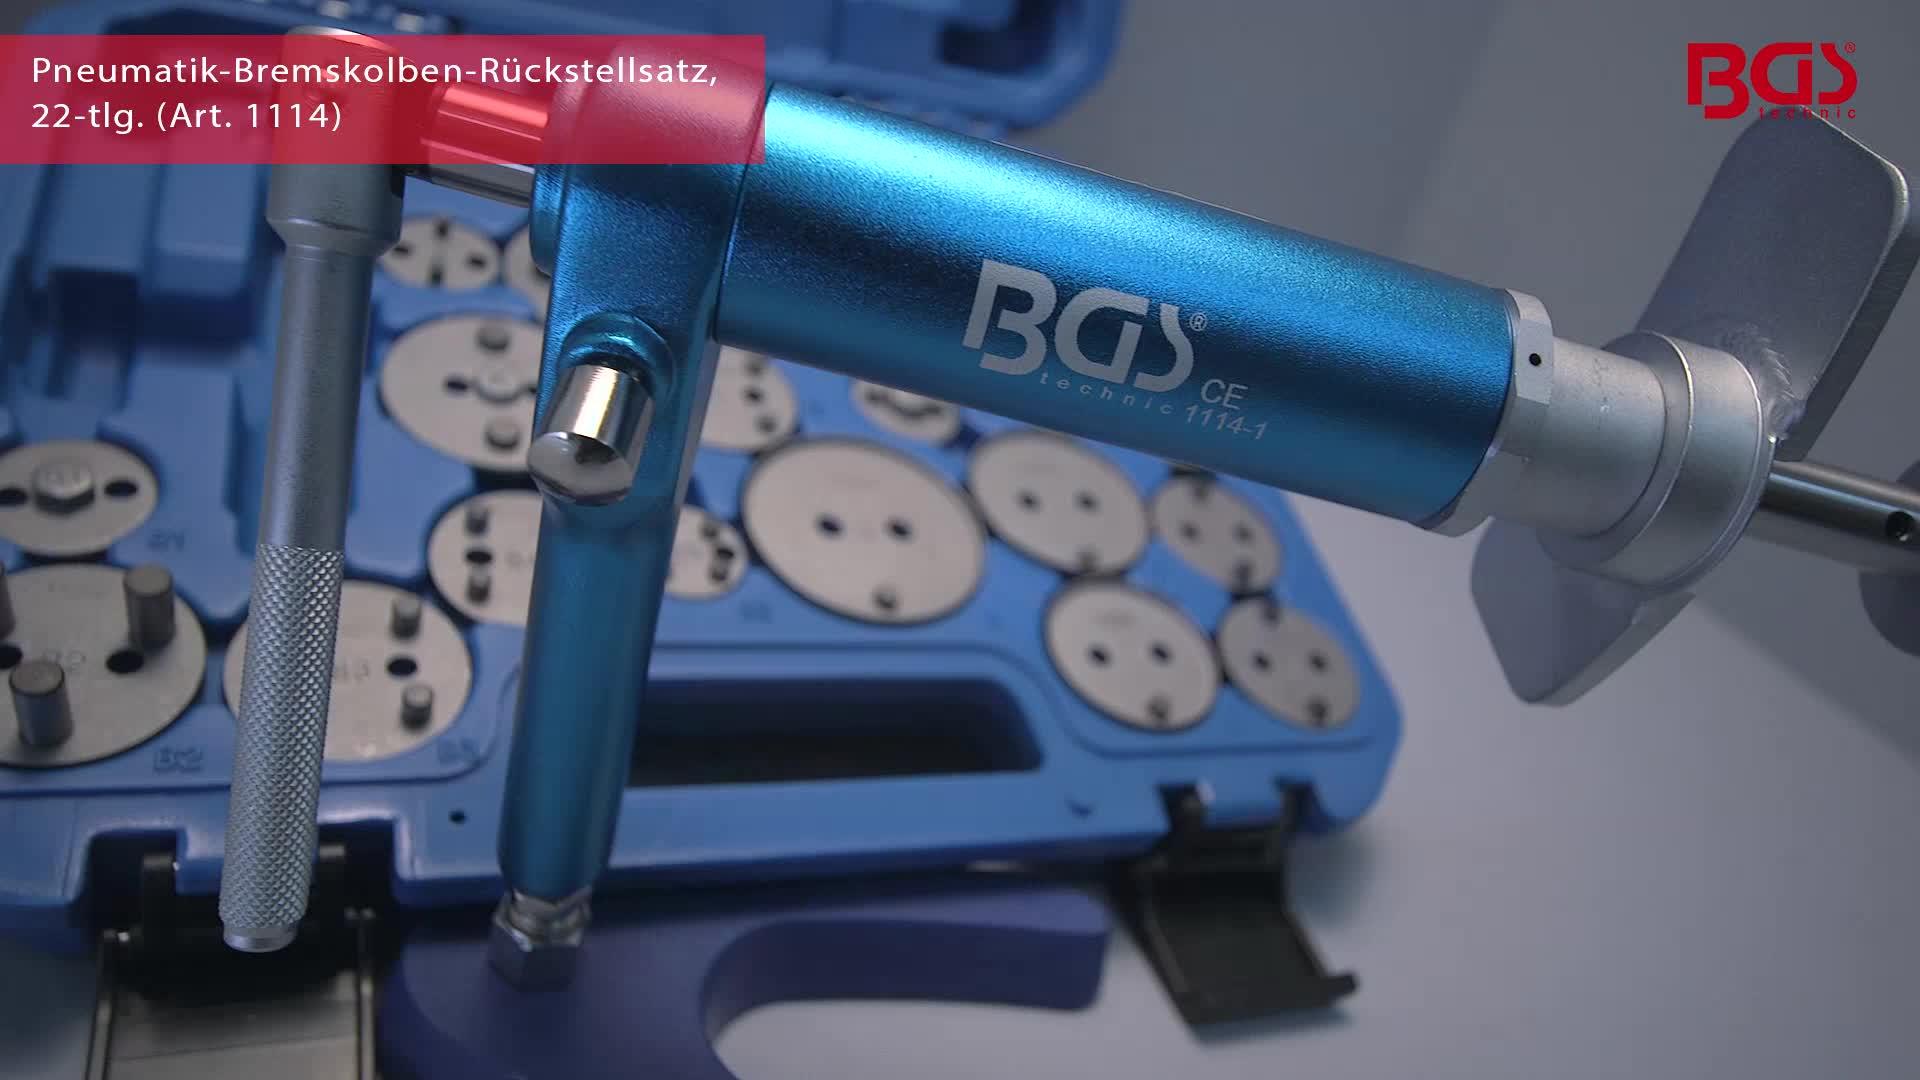 BGS Pneumatik-Bremskolben-Rückstell-Satz 1114 22 teilig Bremsen Satz Druckluft